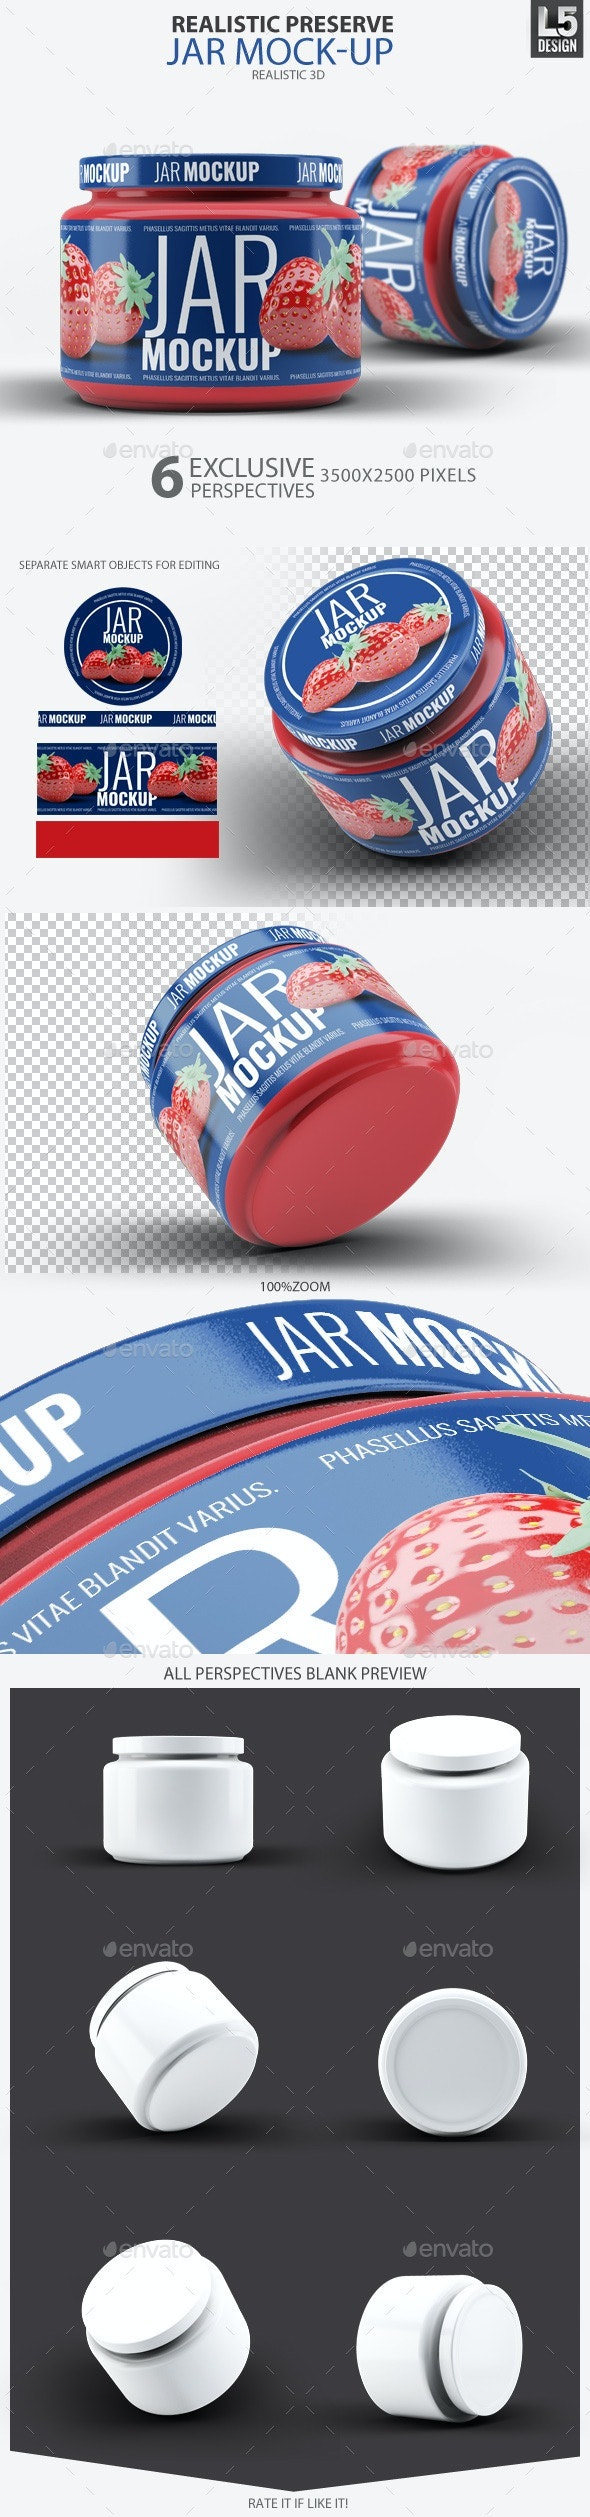 Realistic Preserve Jar Mock-Up - Food and Drink Packaging